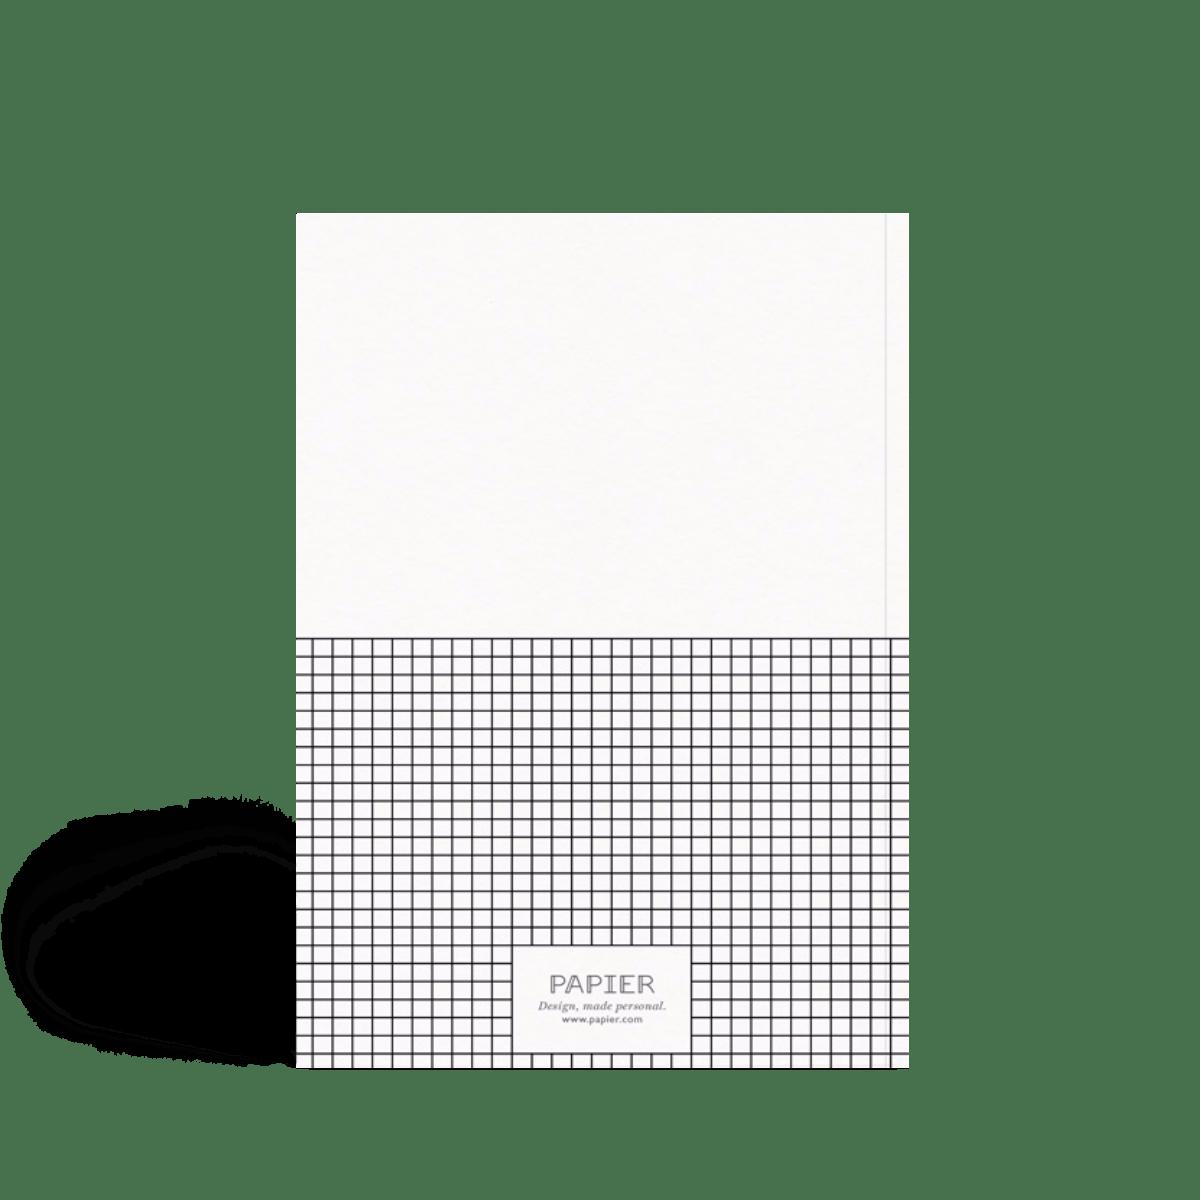 Https%3a%2f%2fwww.papier.com%2fproduct image%2f55668%2f5%2fdemi grid 13370 back 1542299672.png?ixlib=rb 1.1